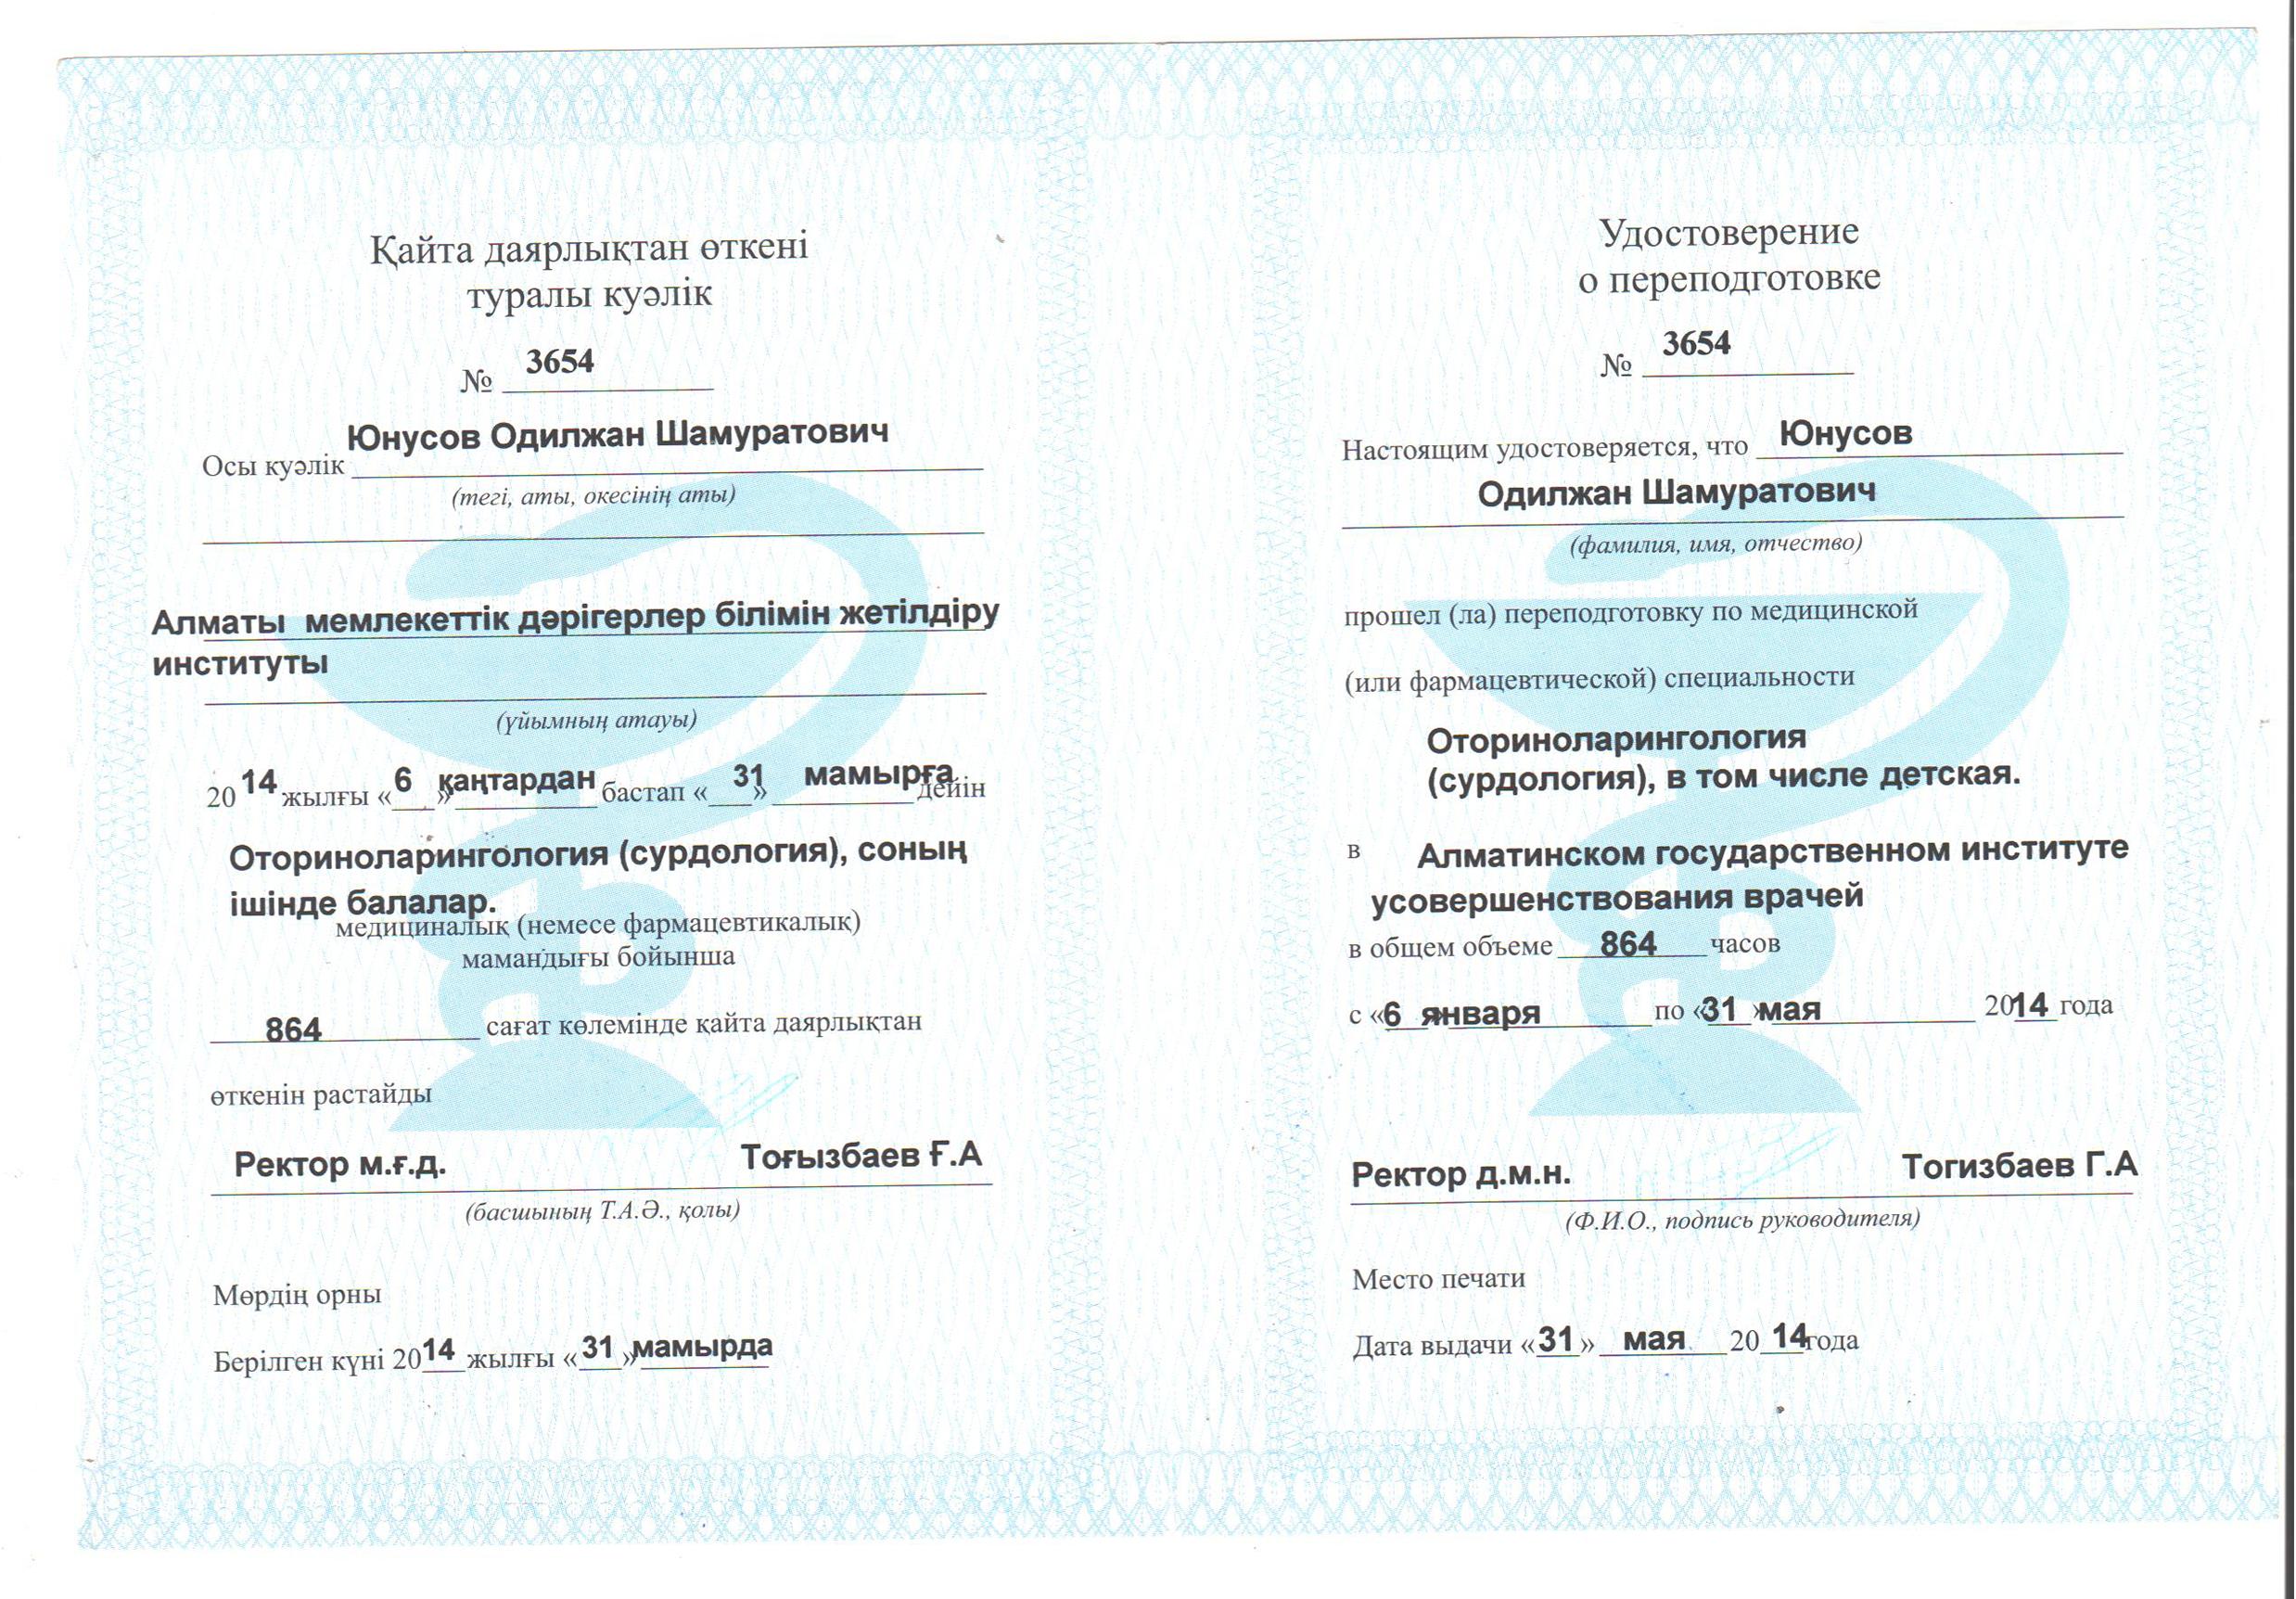 Переподготовка оториноларинголога клиники Akniet Shipa сайрамский р-н. с. Карабулак